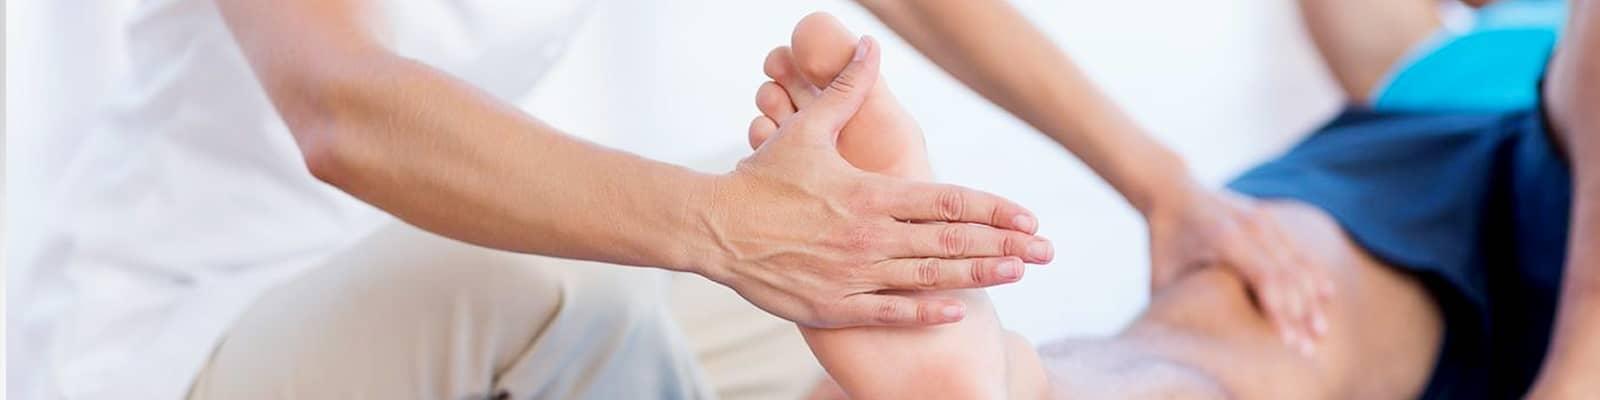 Otras técnicas de fisioterapia